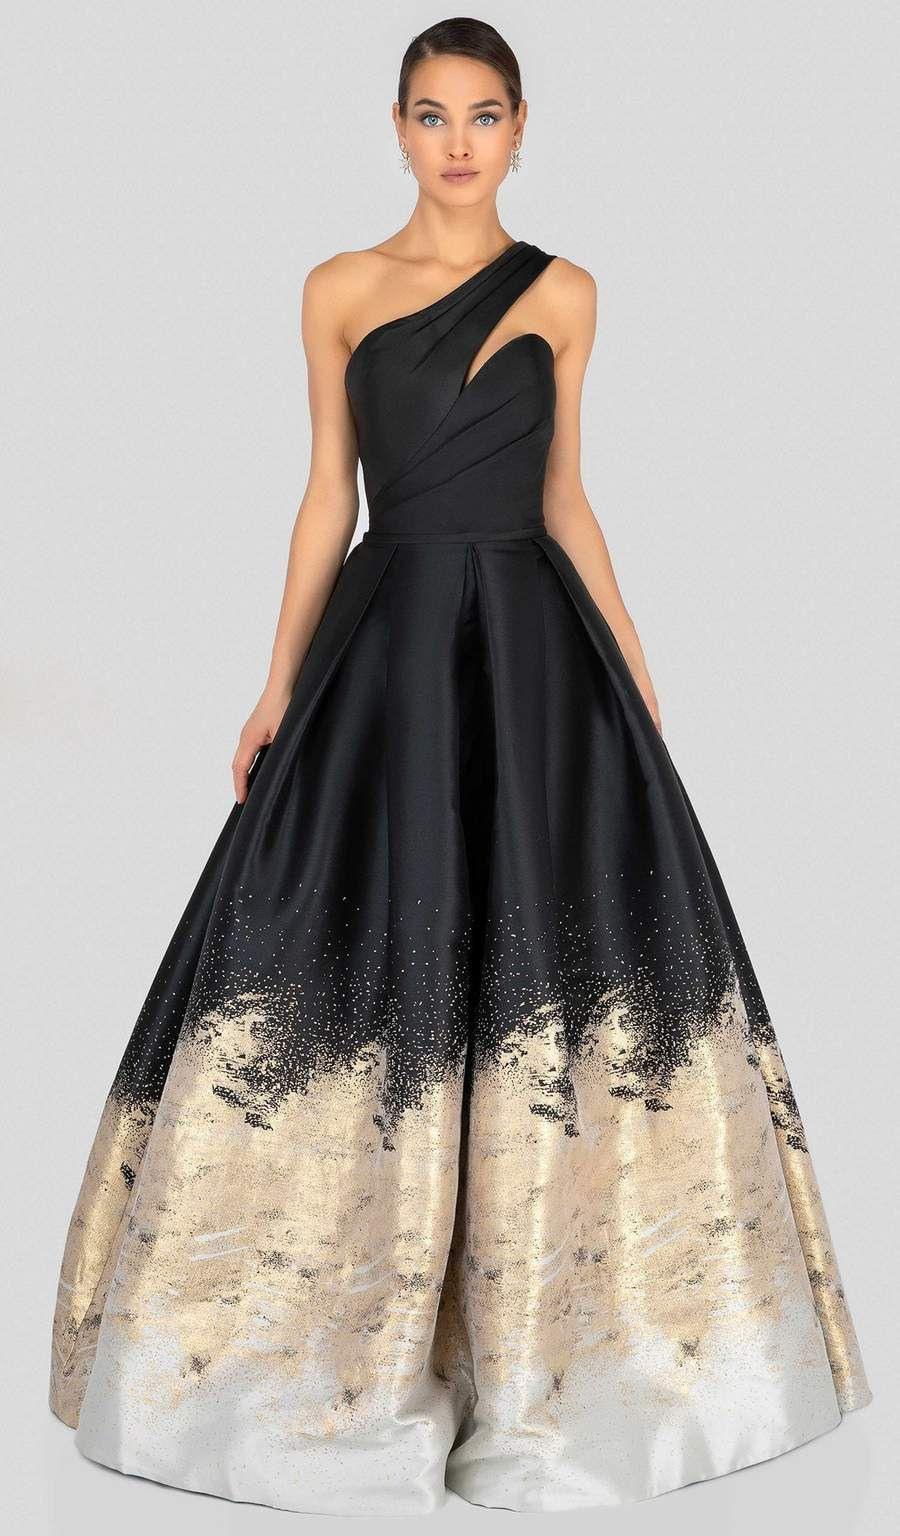 10 Kreativ Terani Couture Abendkleid Vertrieb15 Einfach Terani Couture Abendkleid Spezialgebiet